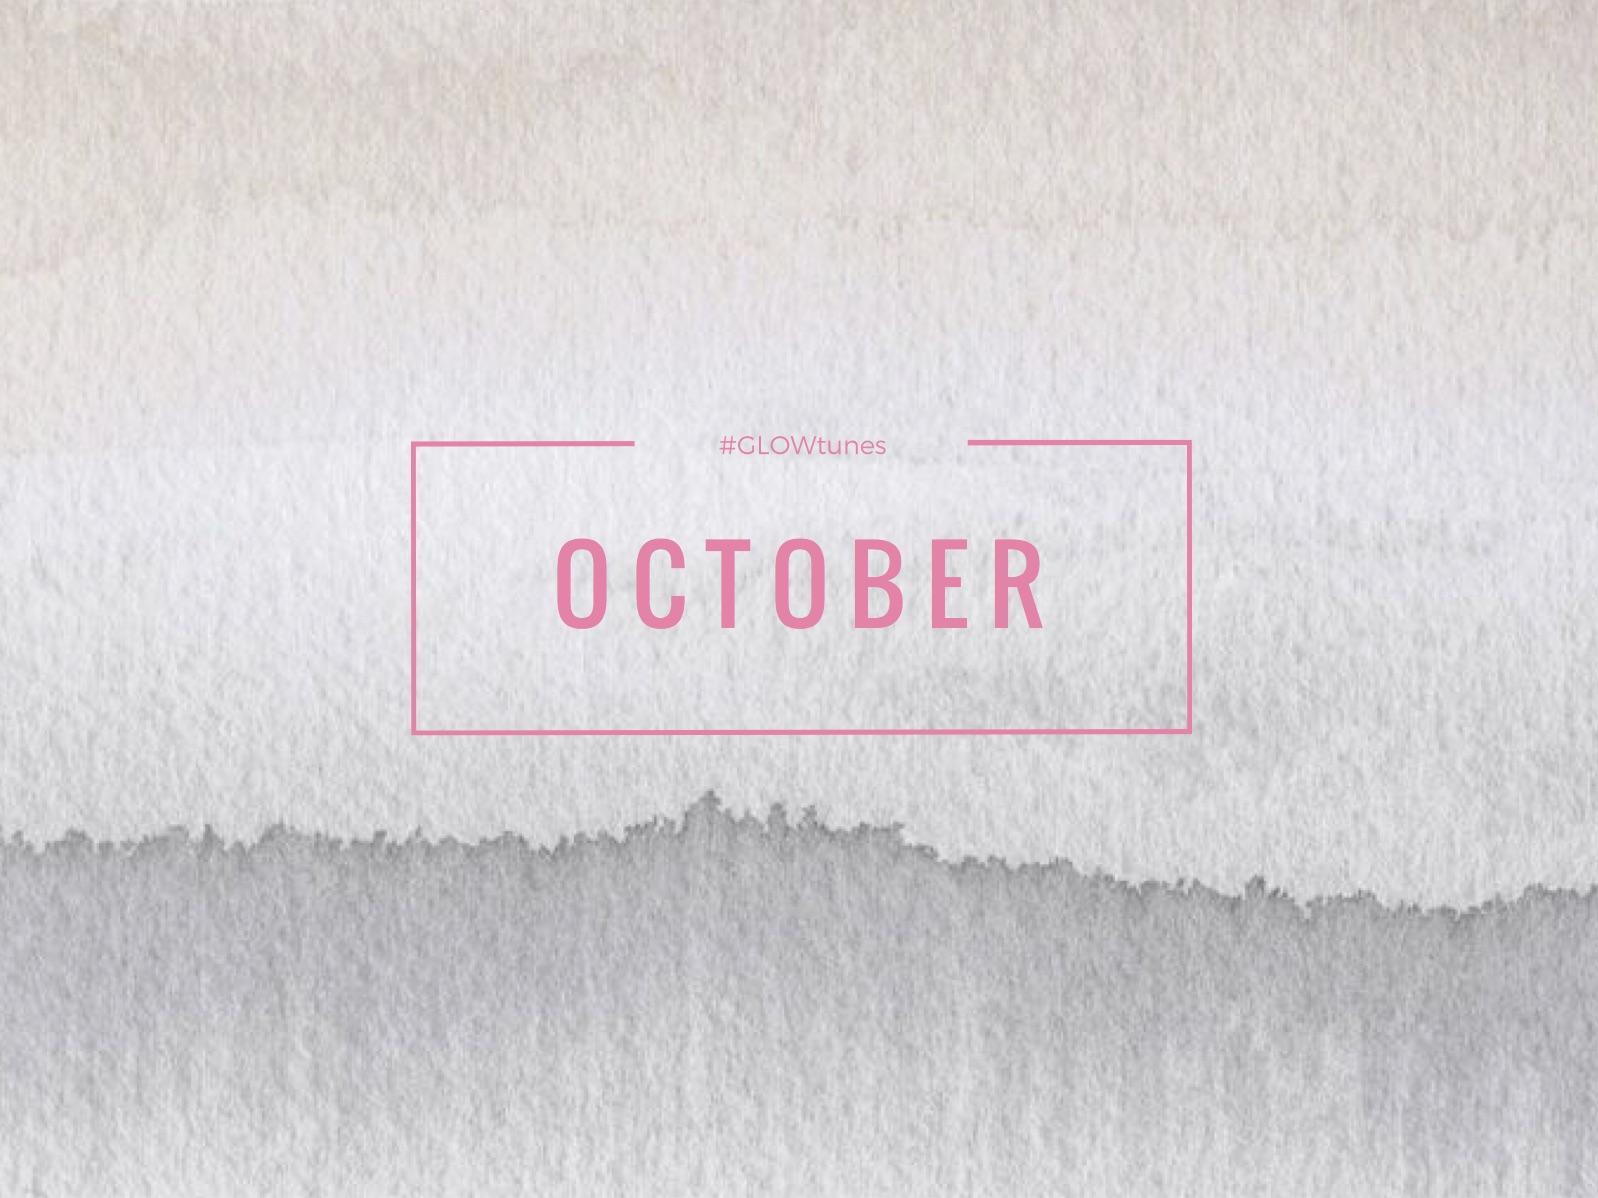 GLOWtunes_Oct17.jpg